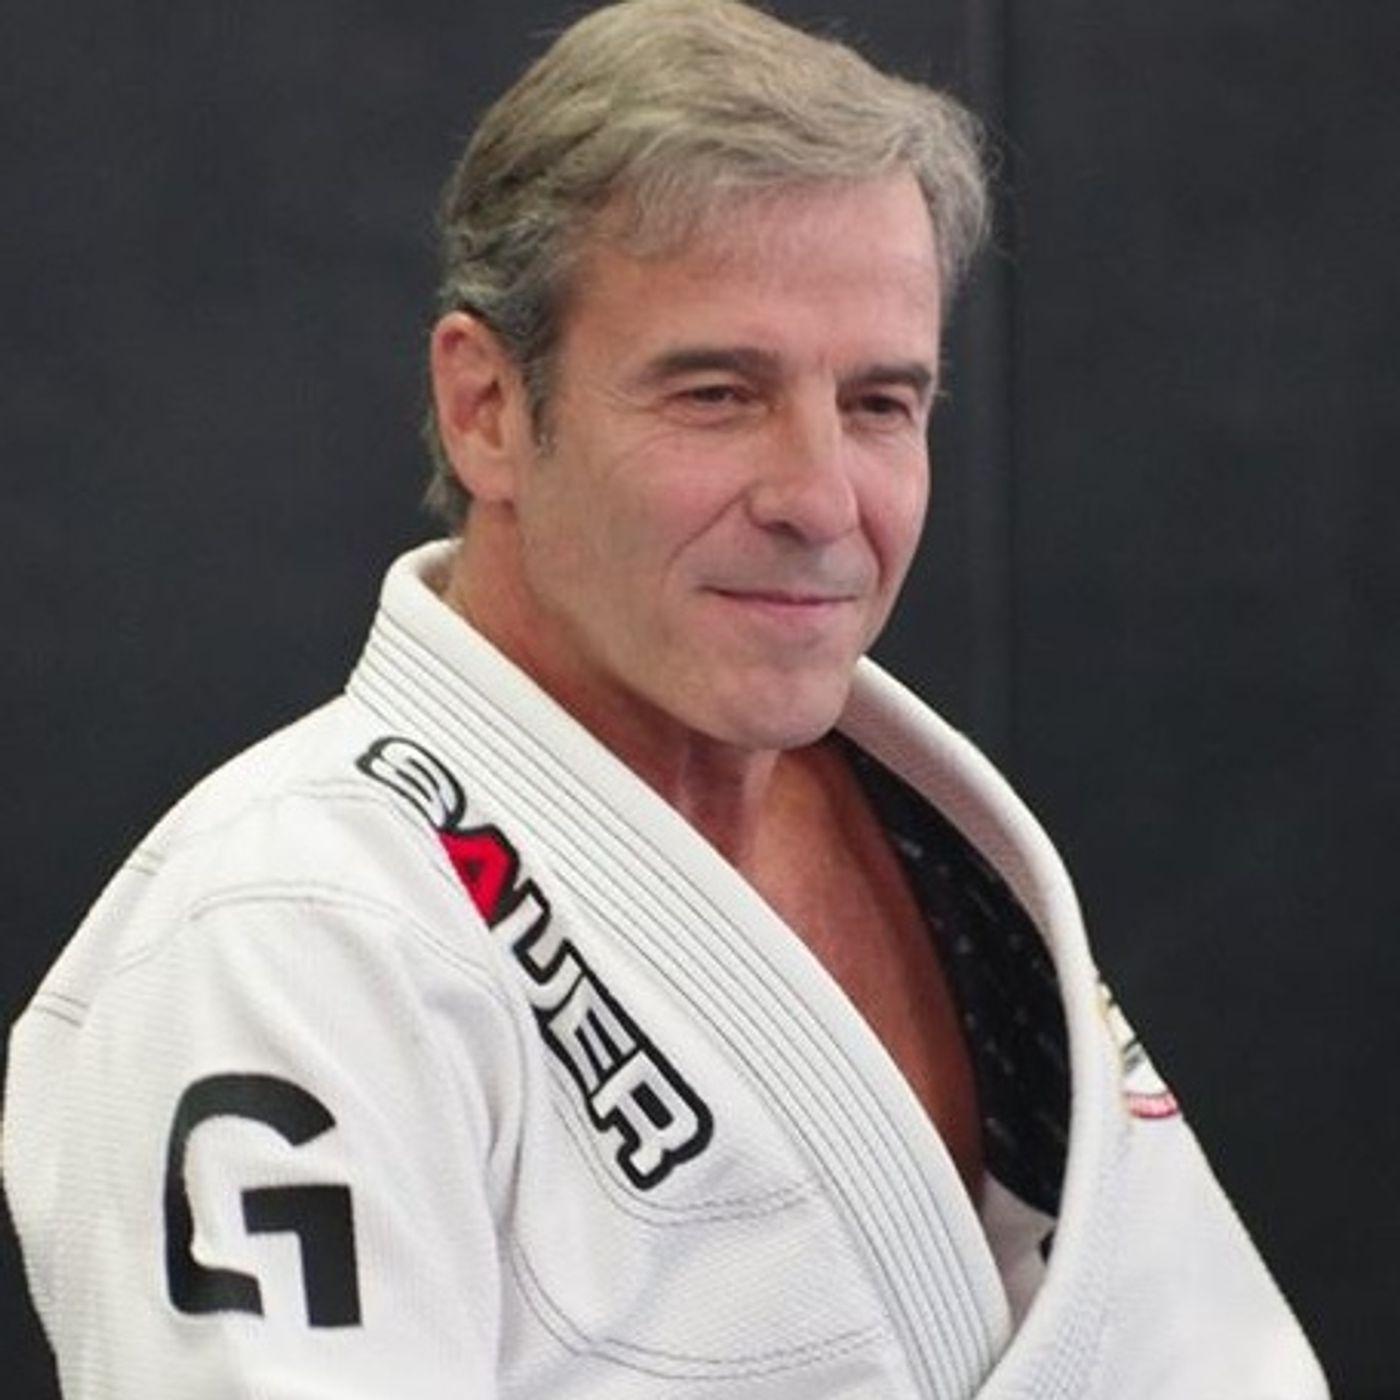 Pedro Sauer